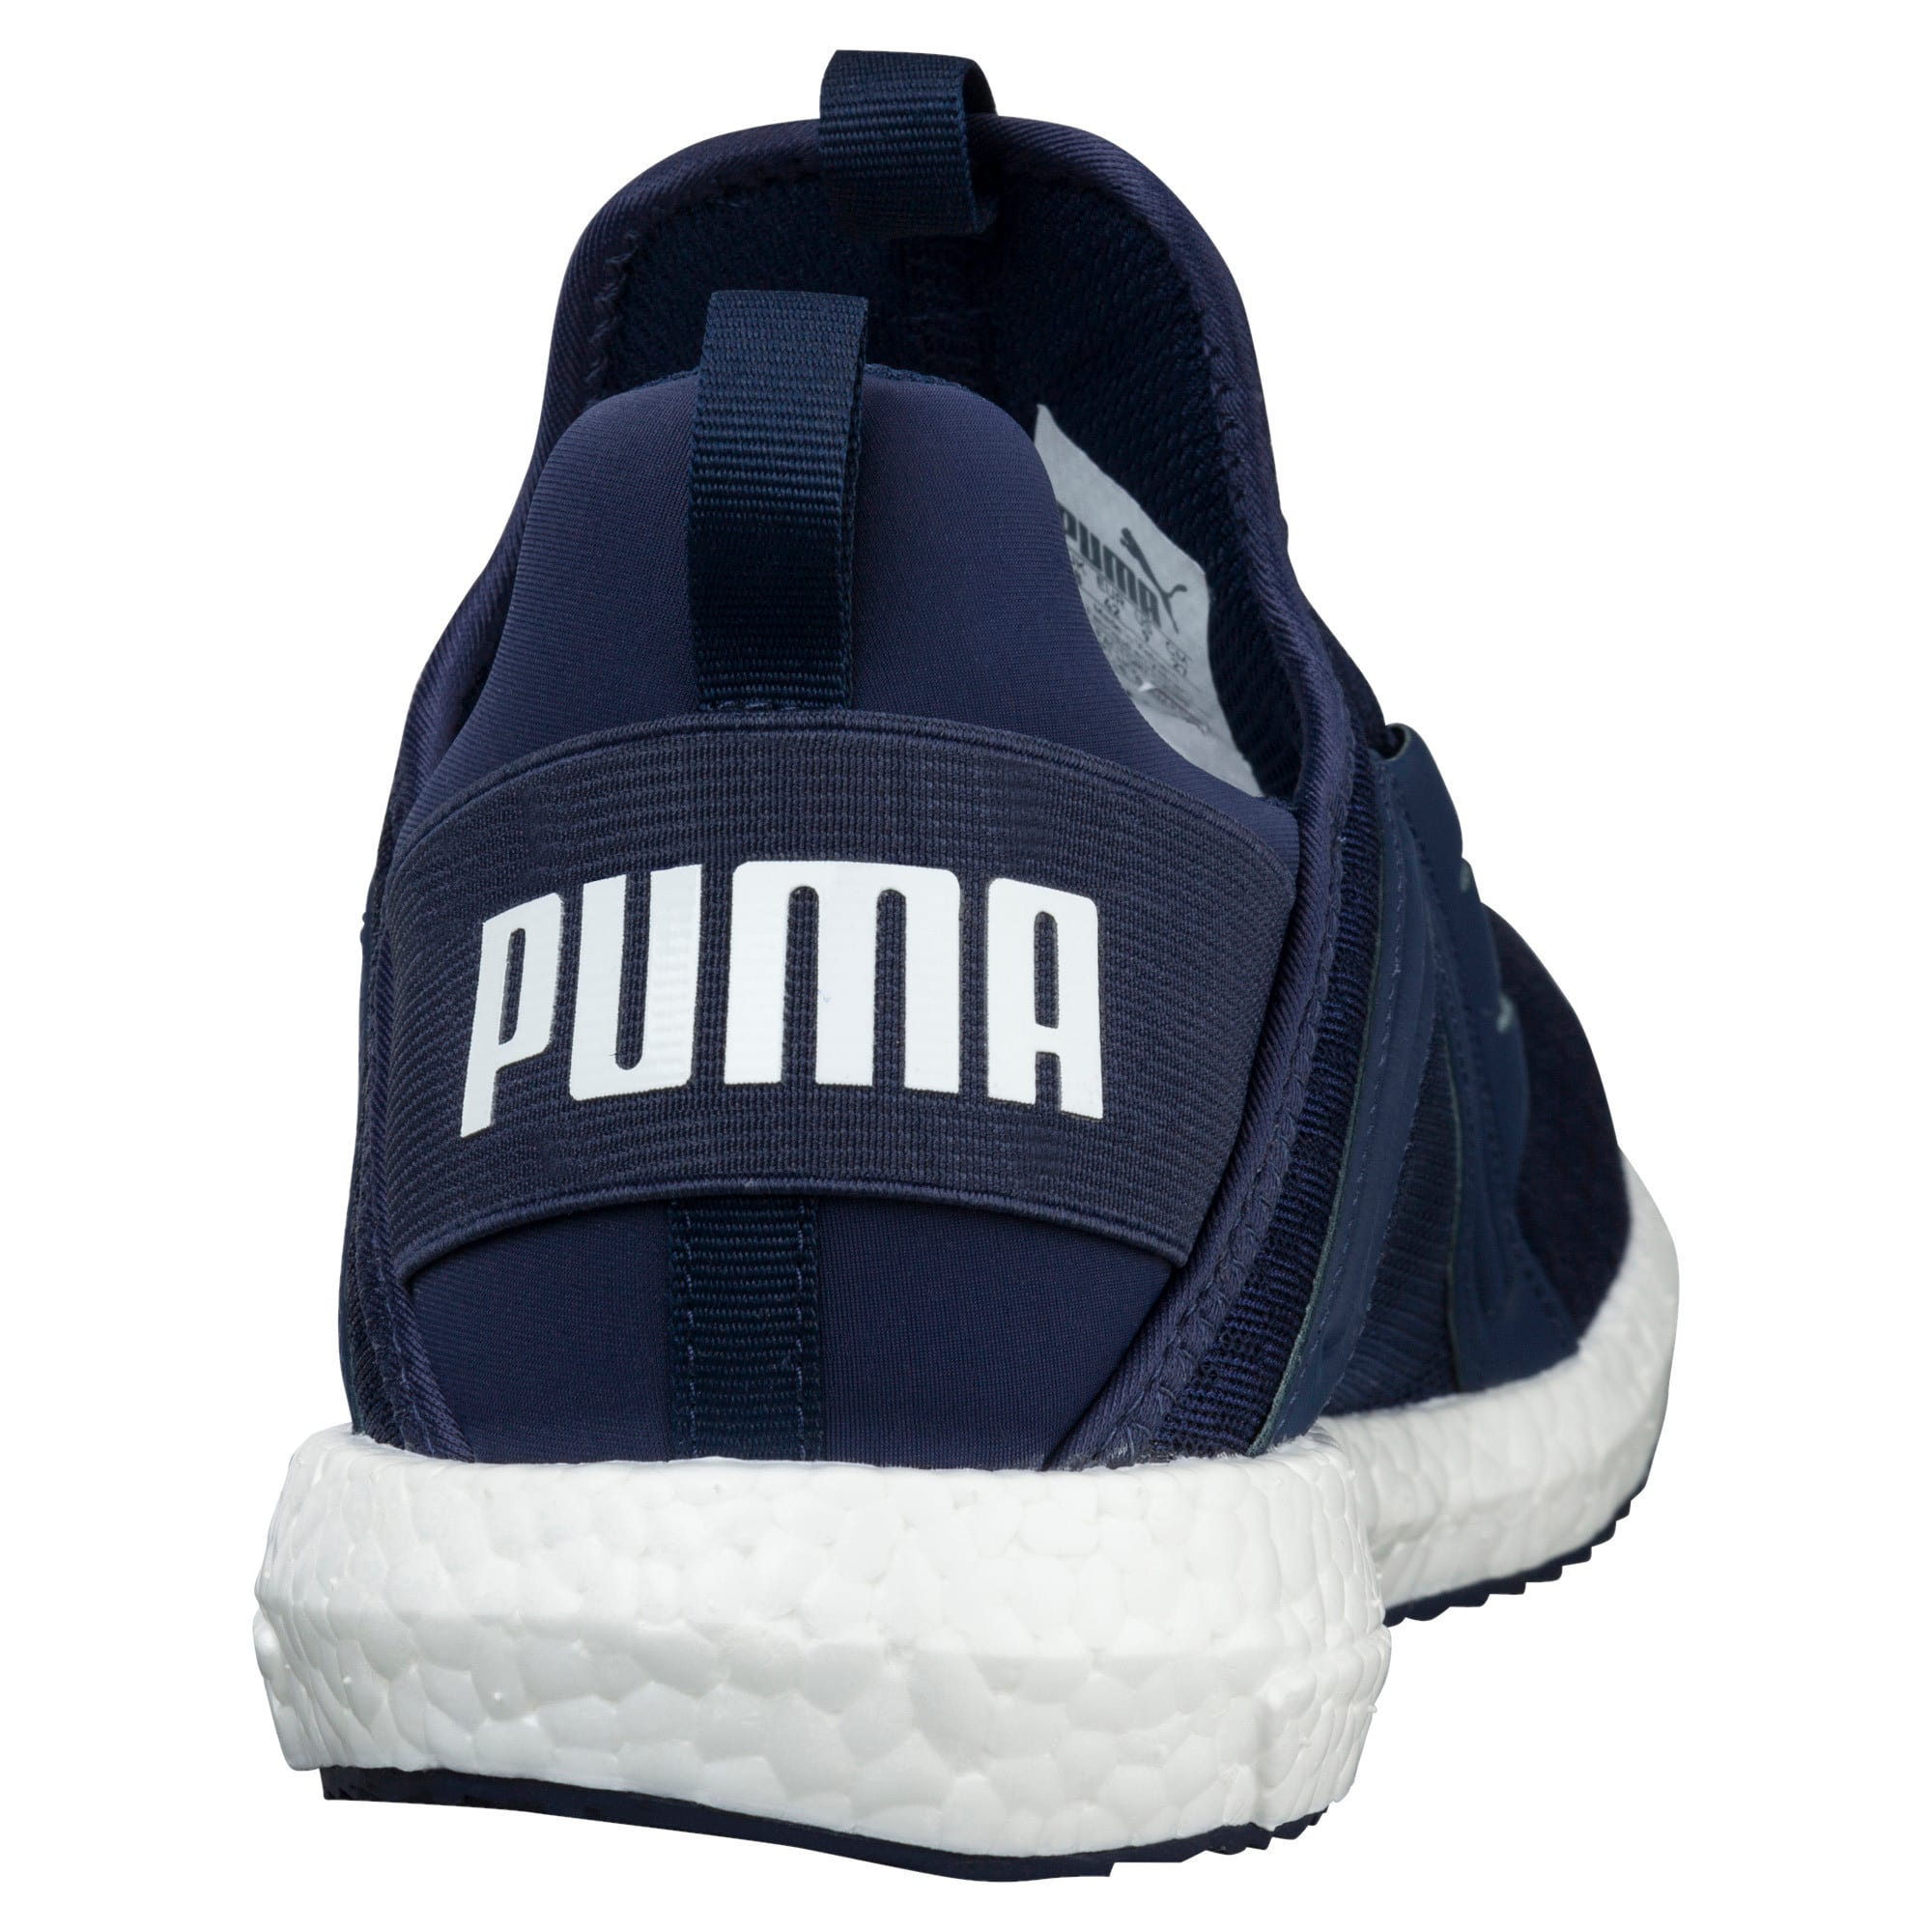 Thumbnail 4 of Mega NRGY Men's Trainers, Peacoat-Puma White, medium-IND